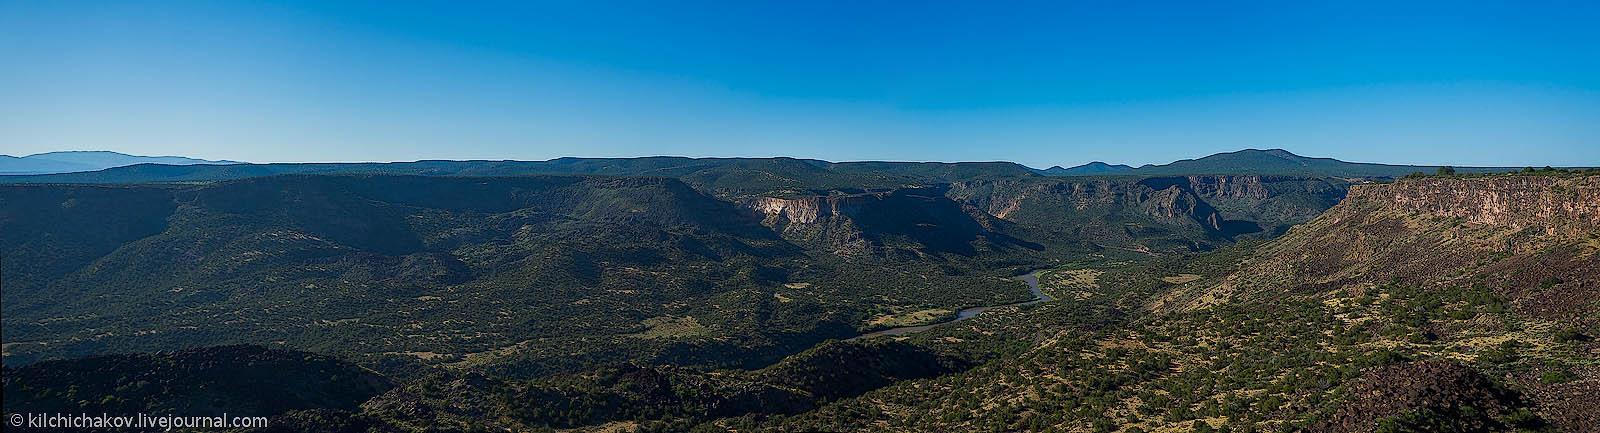 DSC09554 Panorama copy